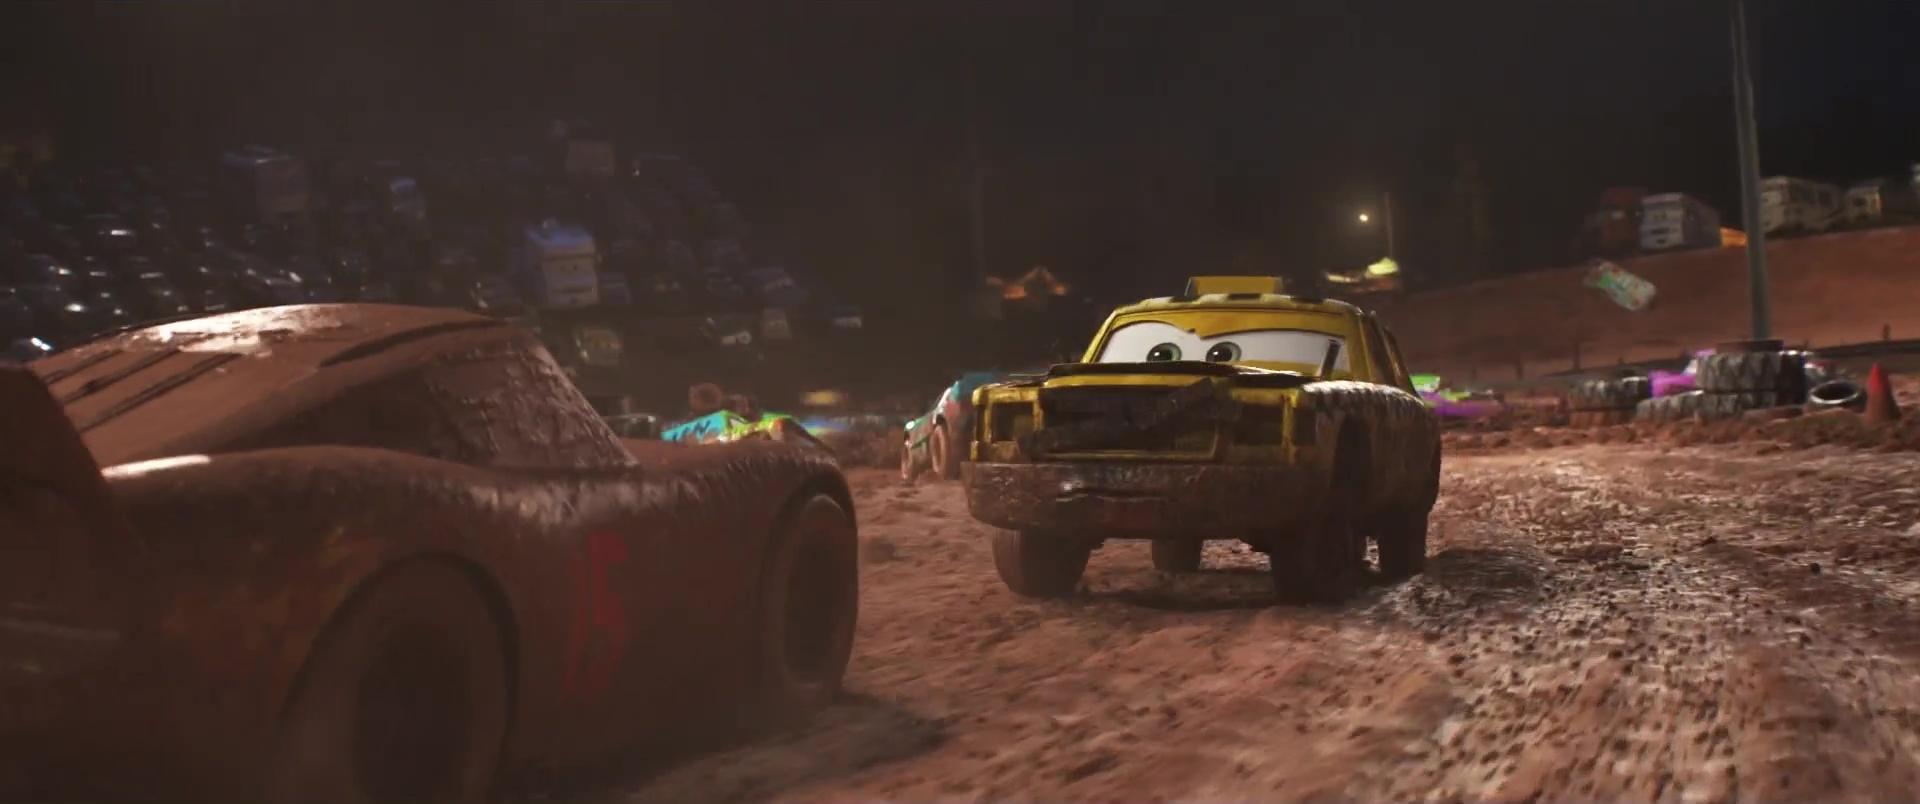 faregame personnage character disney pixar cars 3